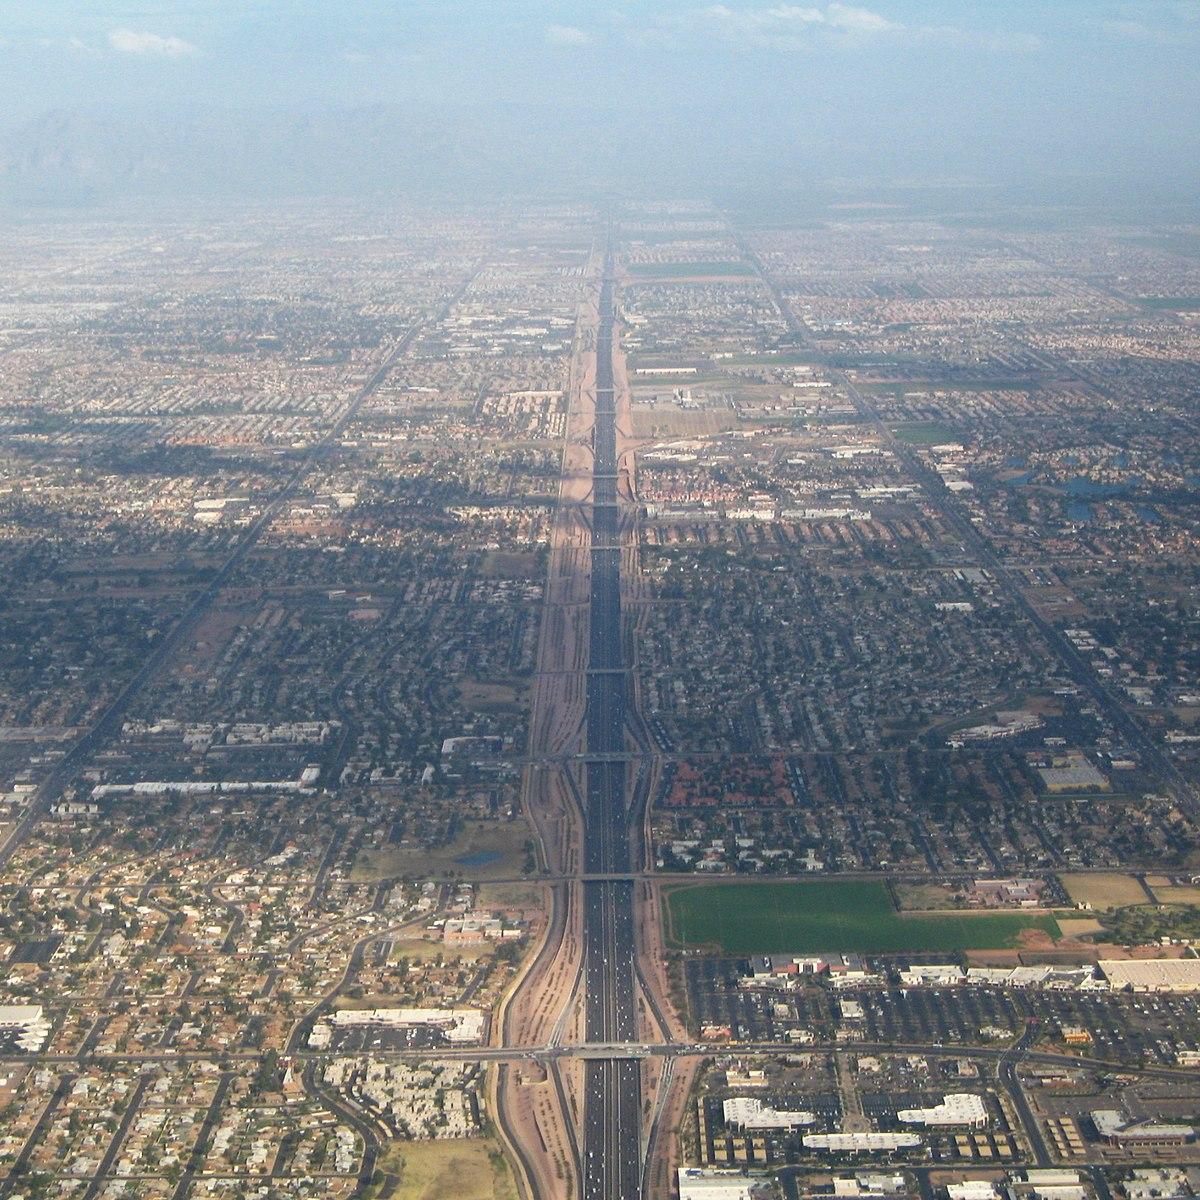 U S  Route 60 in Arizona - Wikipedia